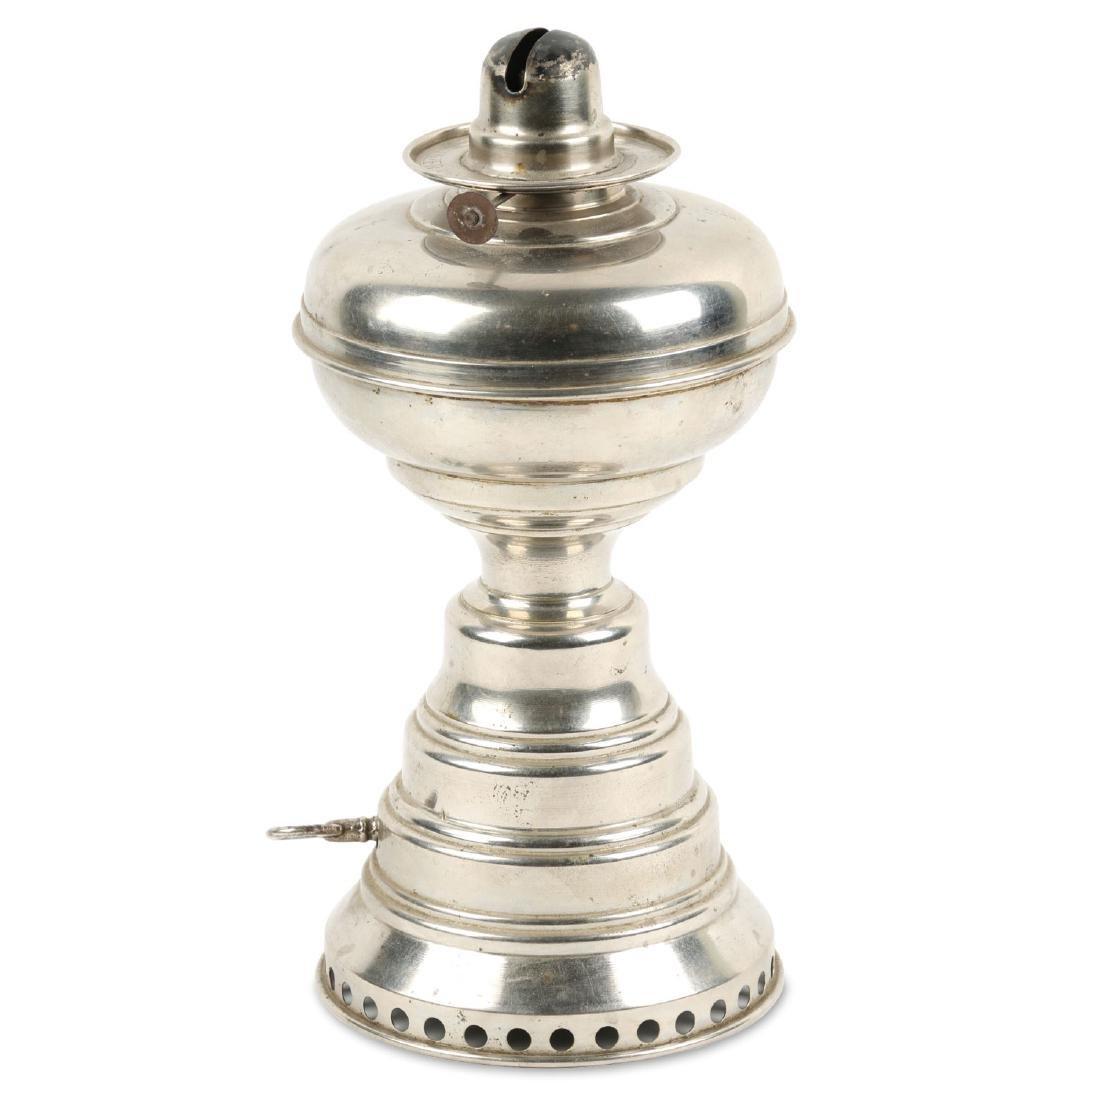 Scarce Mechanical Wanzer Oil Lamp